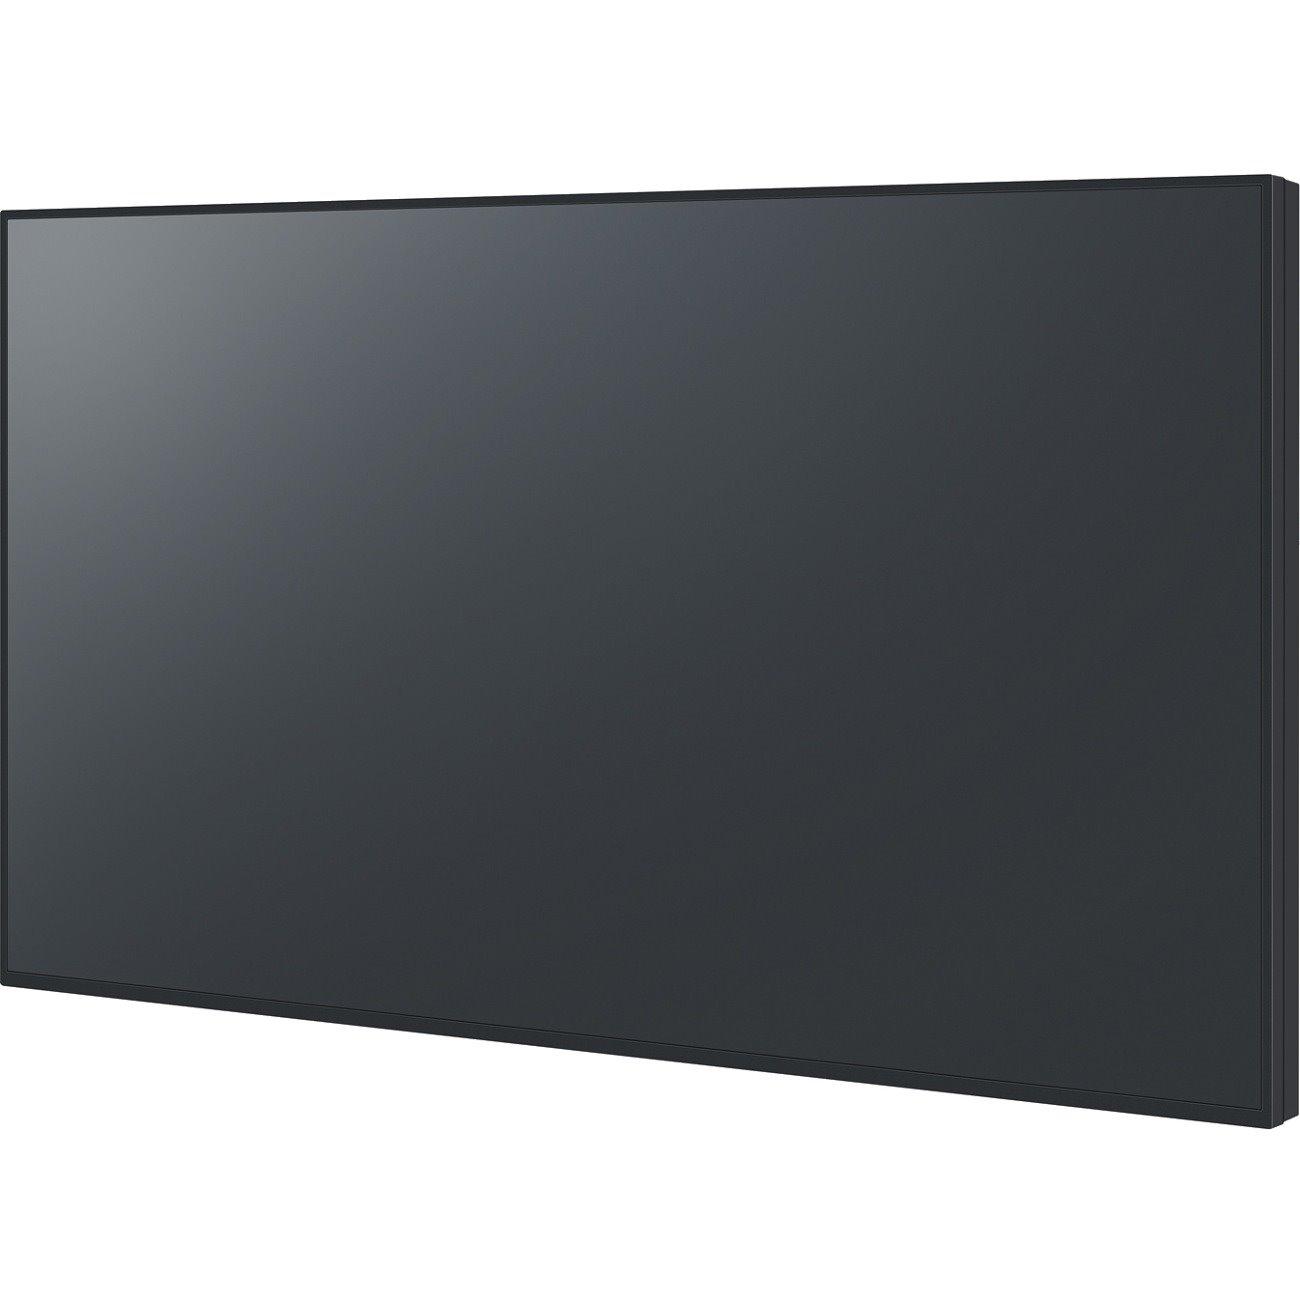 "Panasonic TH-55SF2W 139.7 cm (55"") LCD Digital Signage Display"